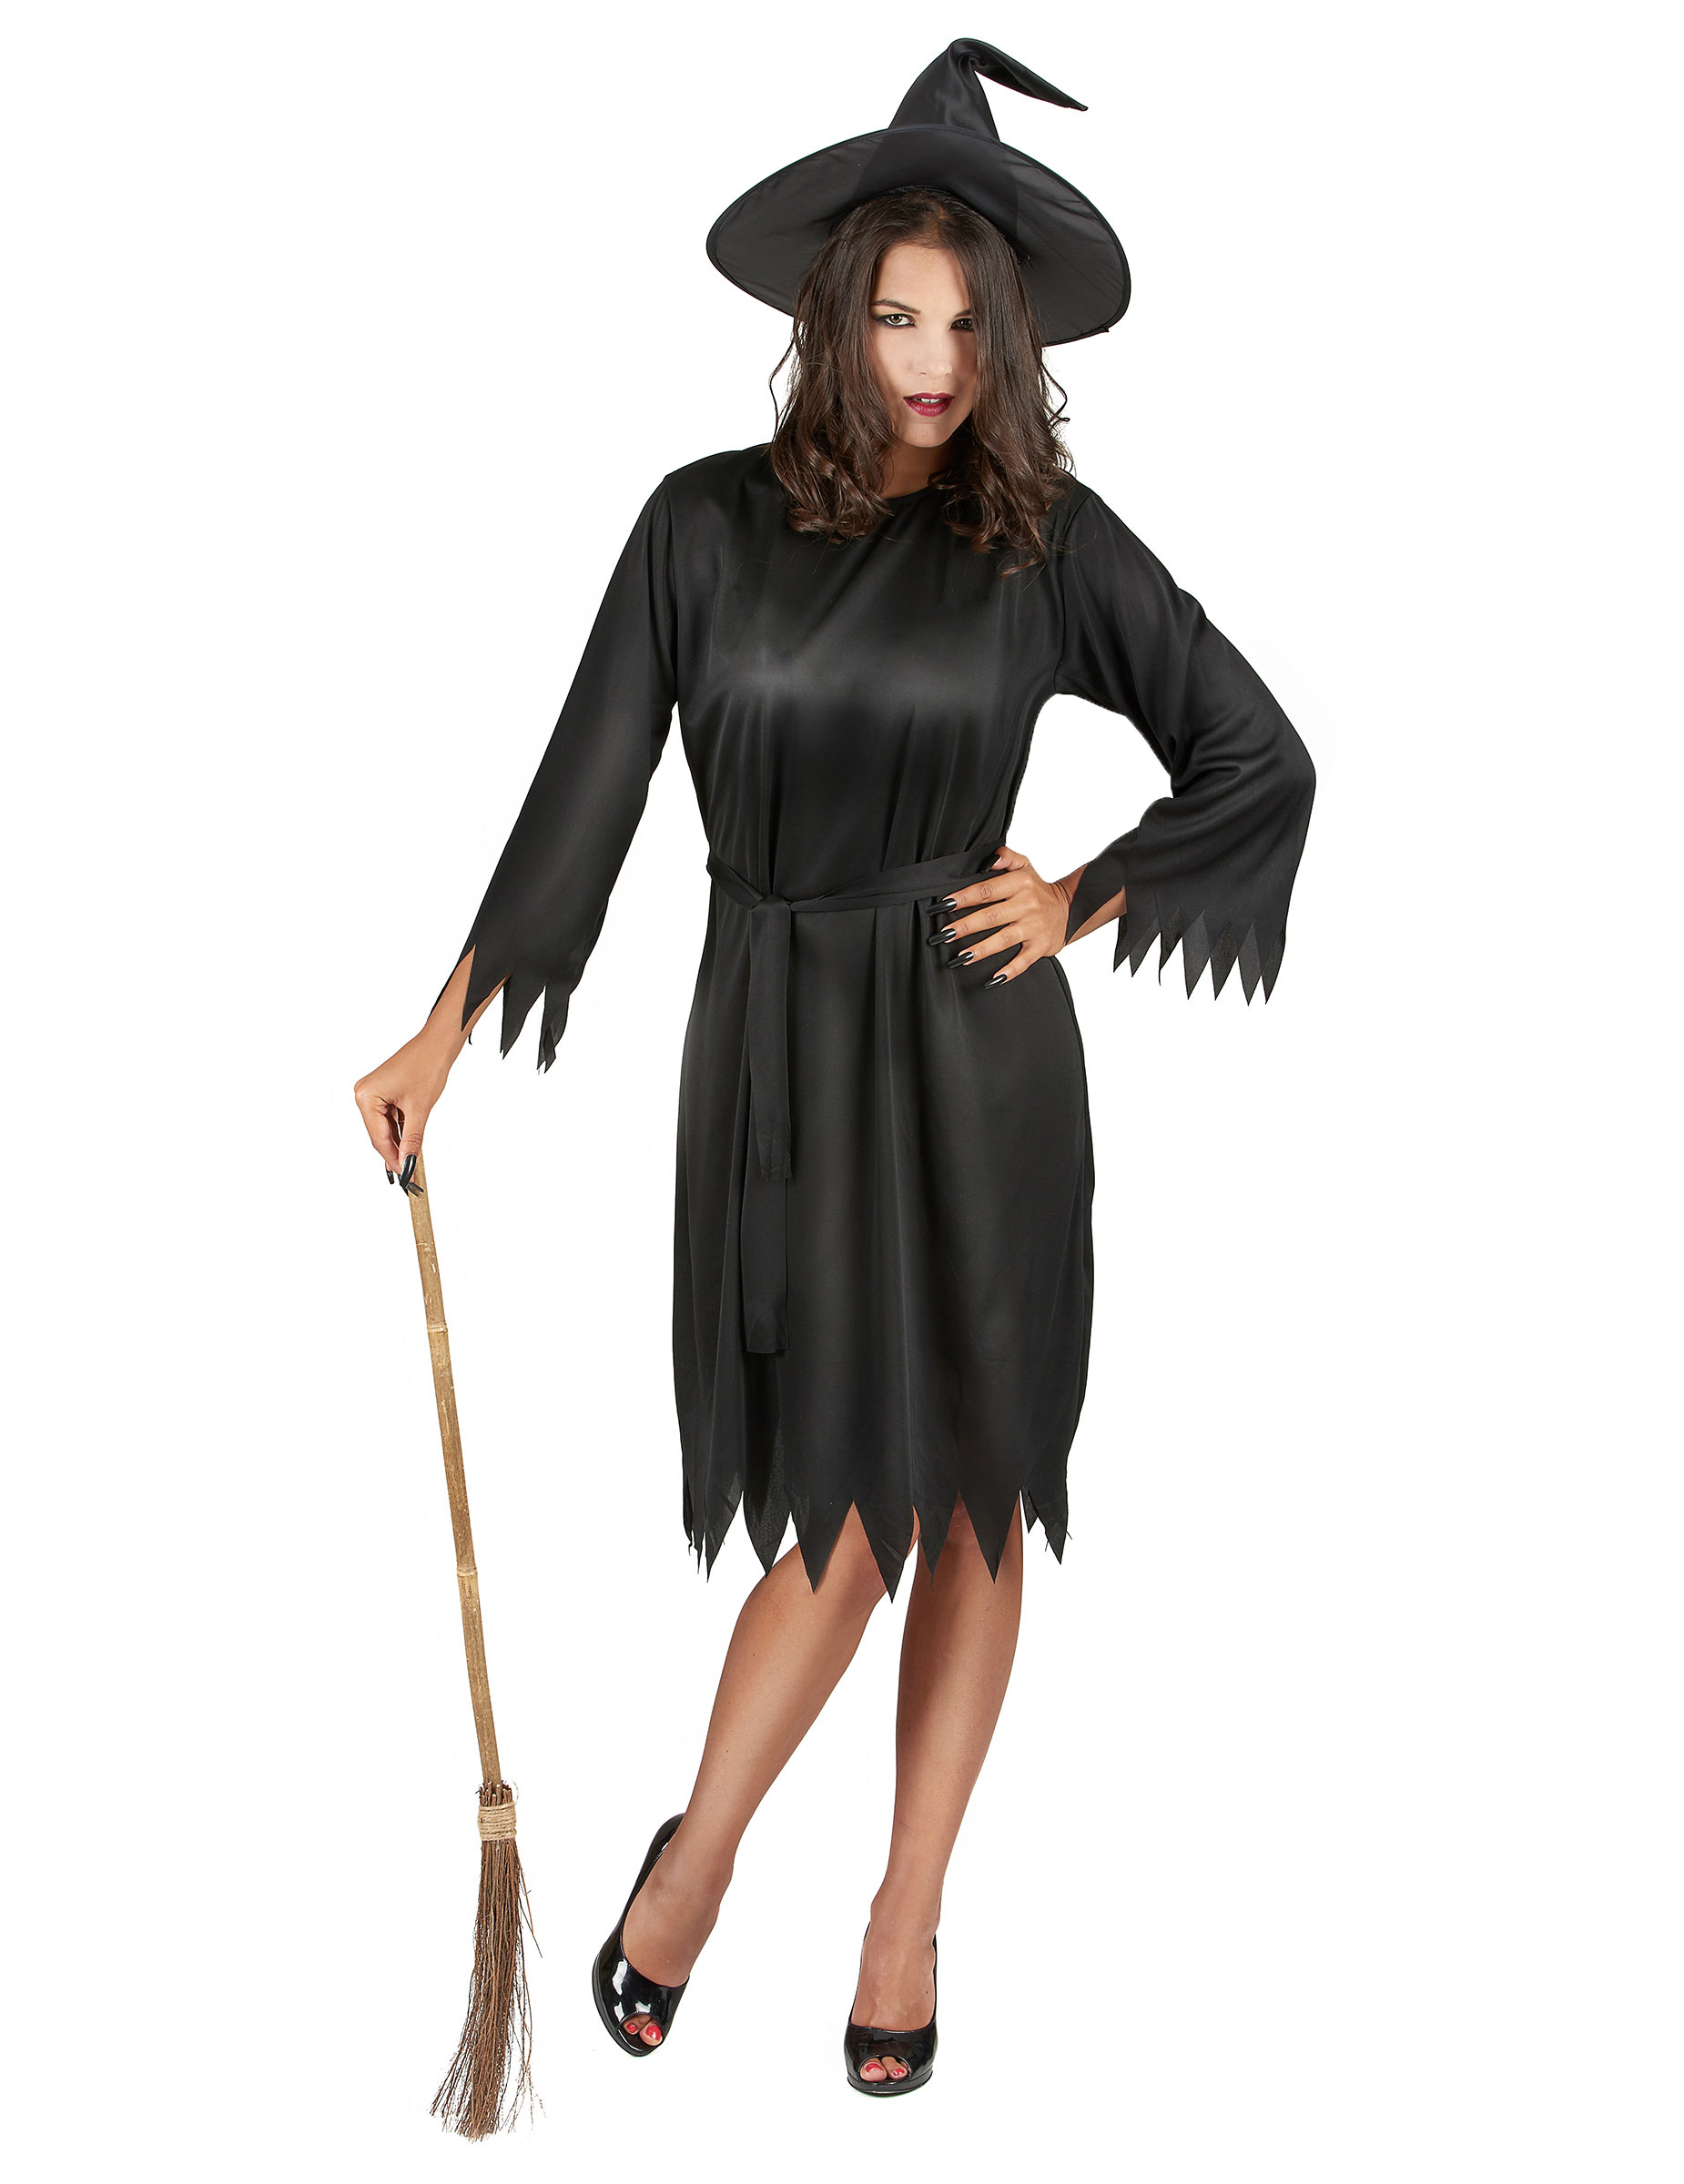 d guisement noir sorci re femme halloween deguise toi. Black Bedroom Furniture Sets. Home Design Ideas